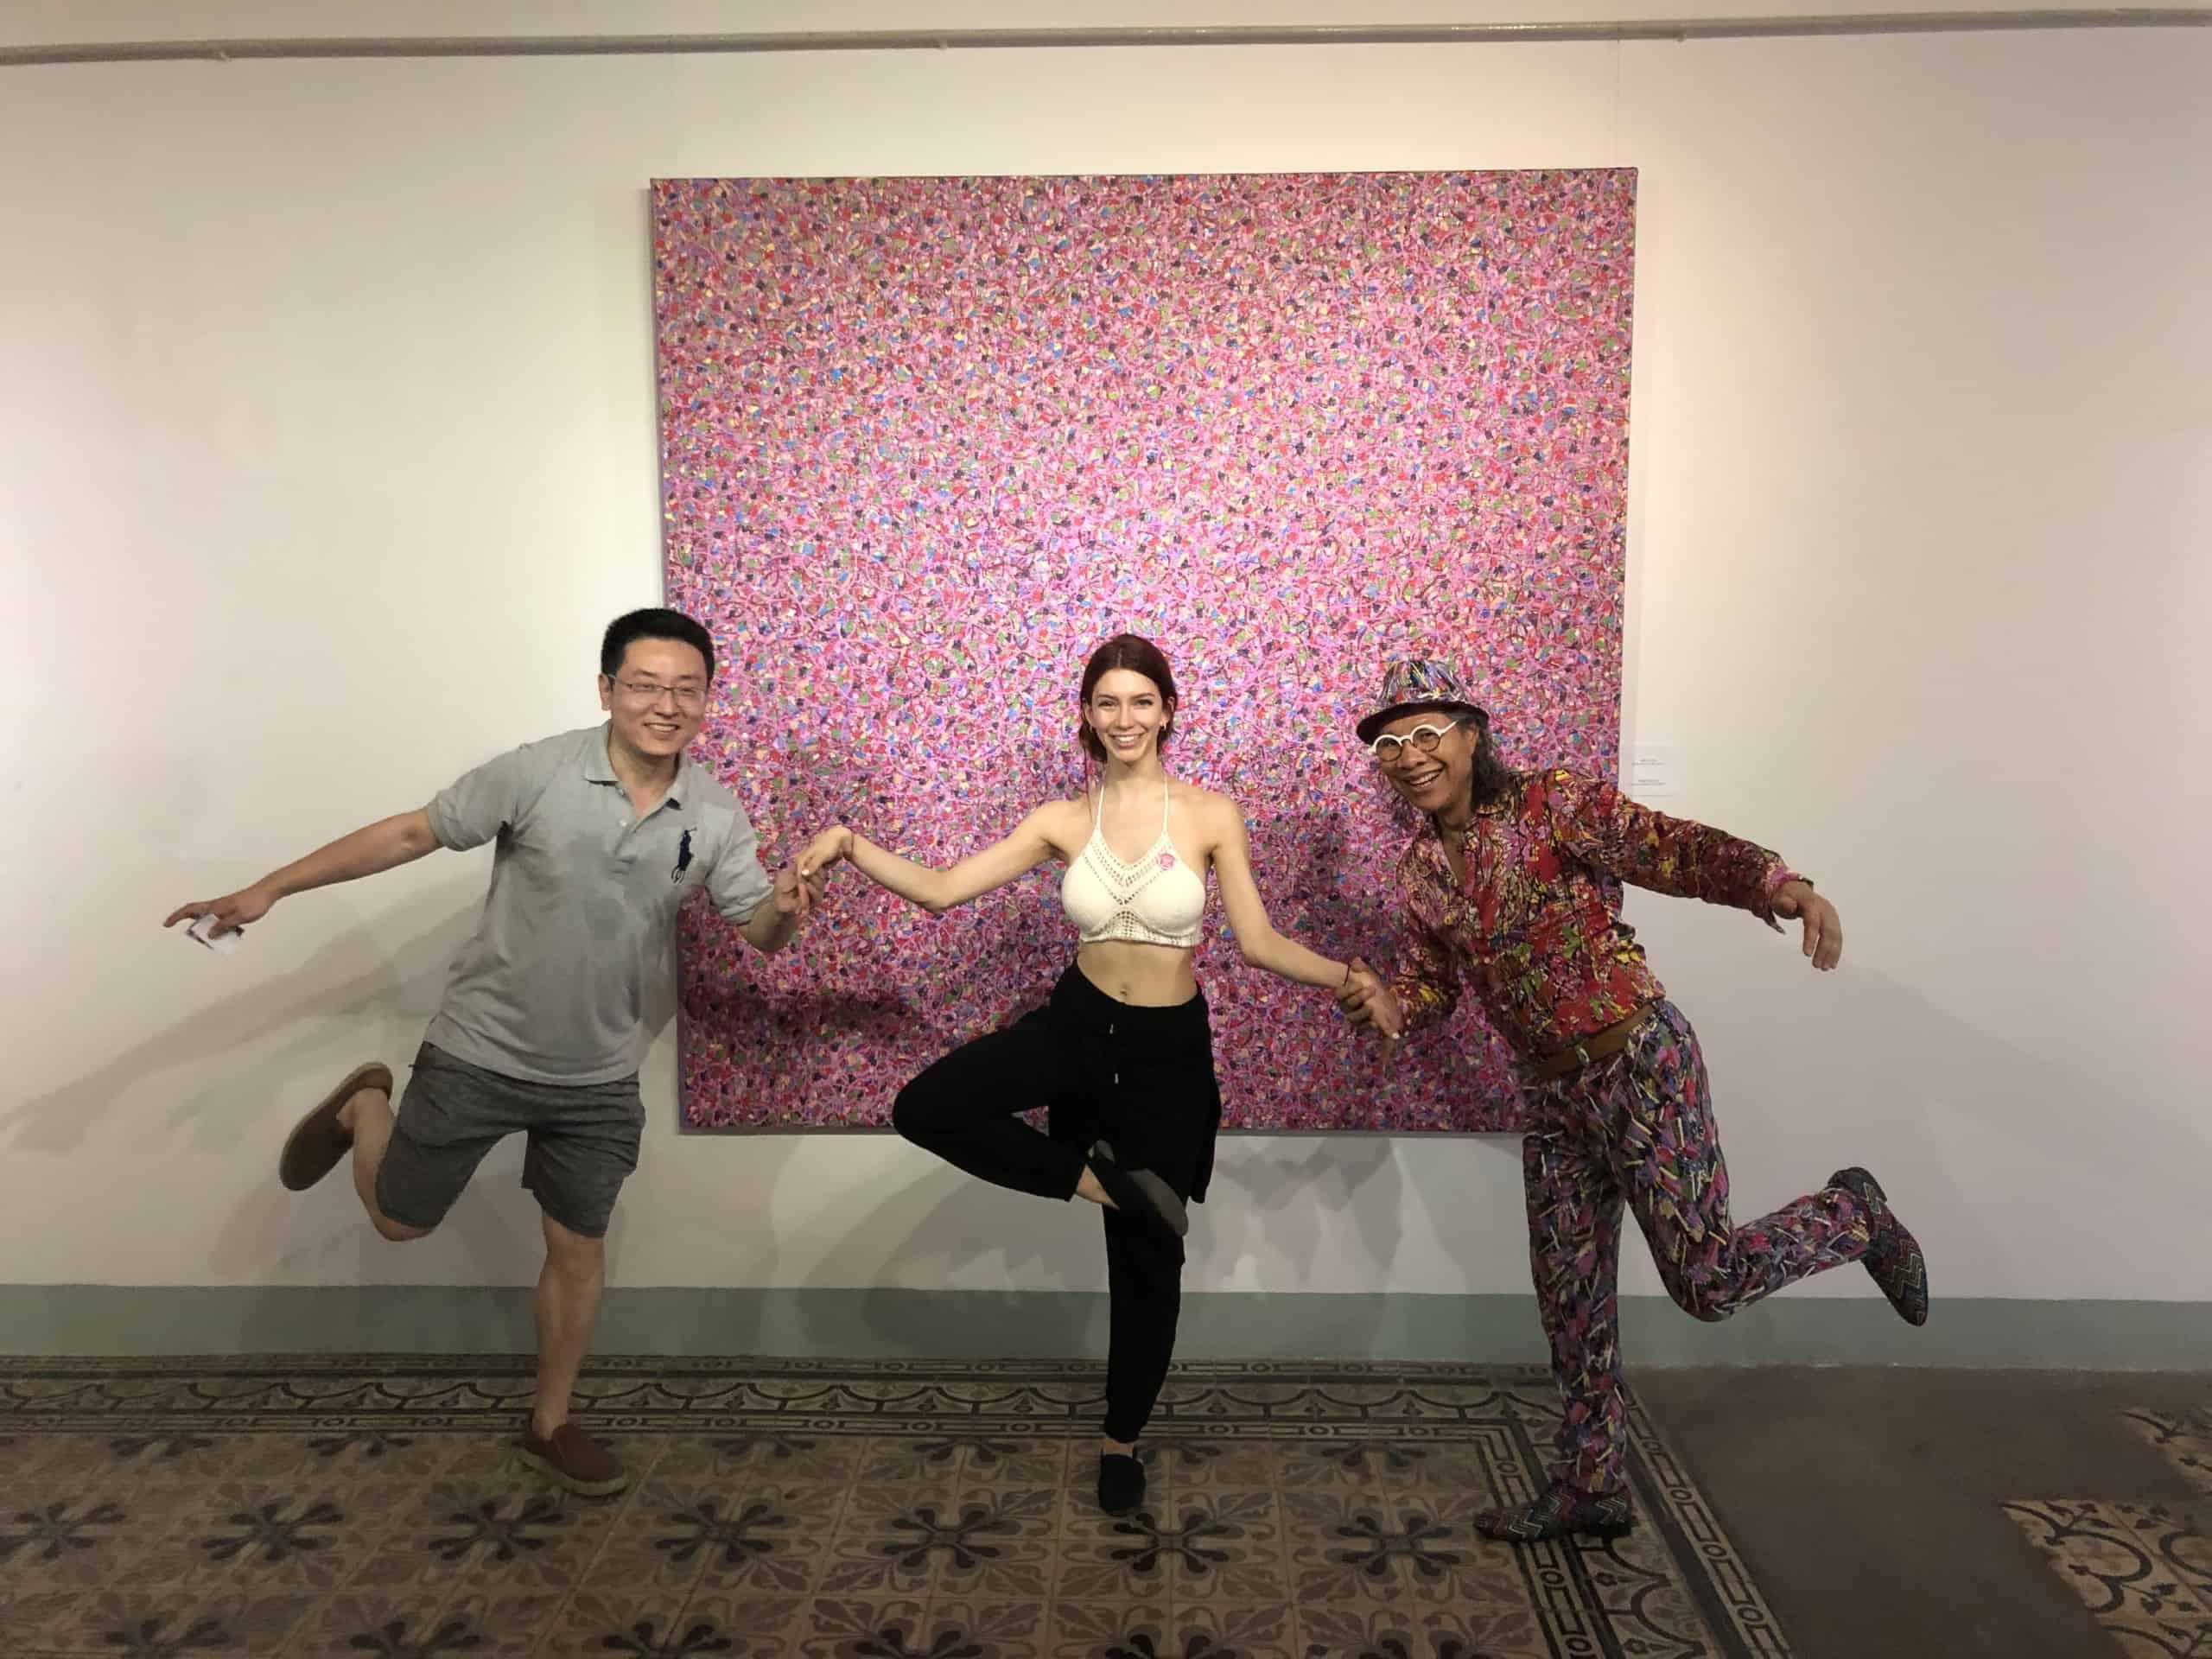 f7-5-Flowers-2018#12_200x200_acrylic-on-canvas_HoChiMinhMuseum3 (1)